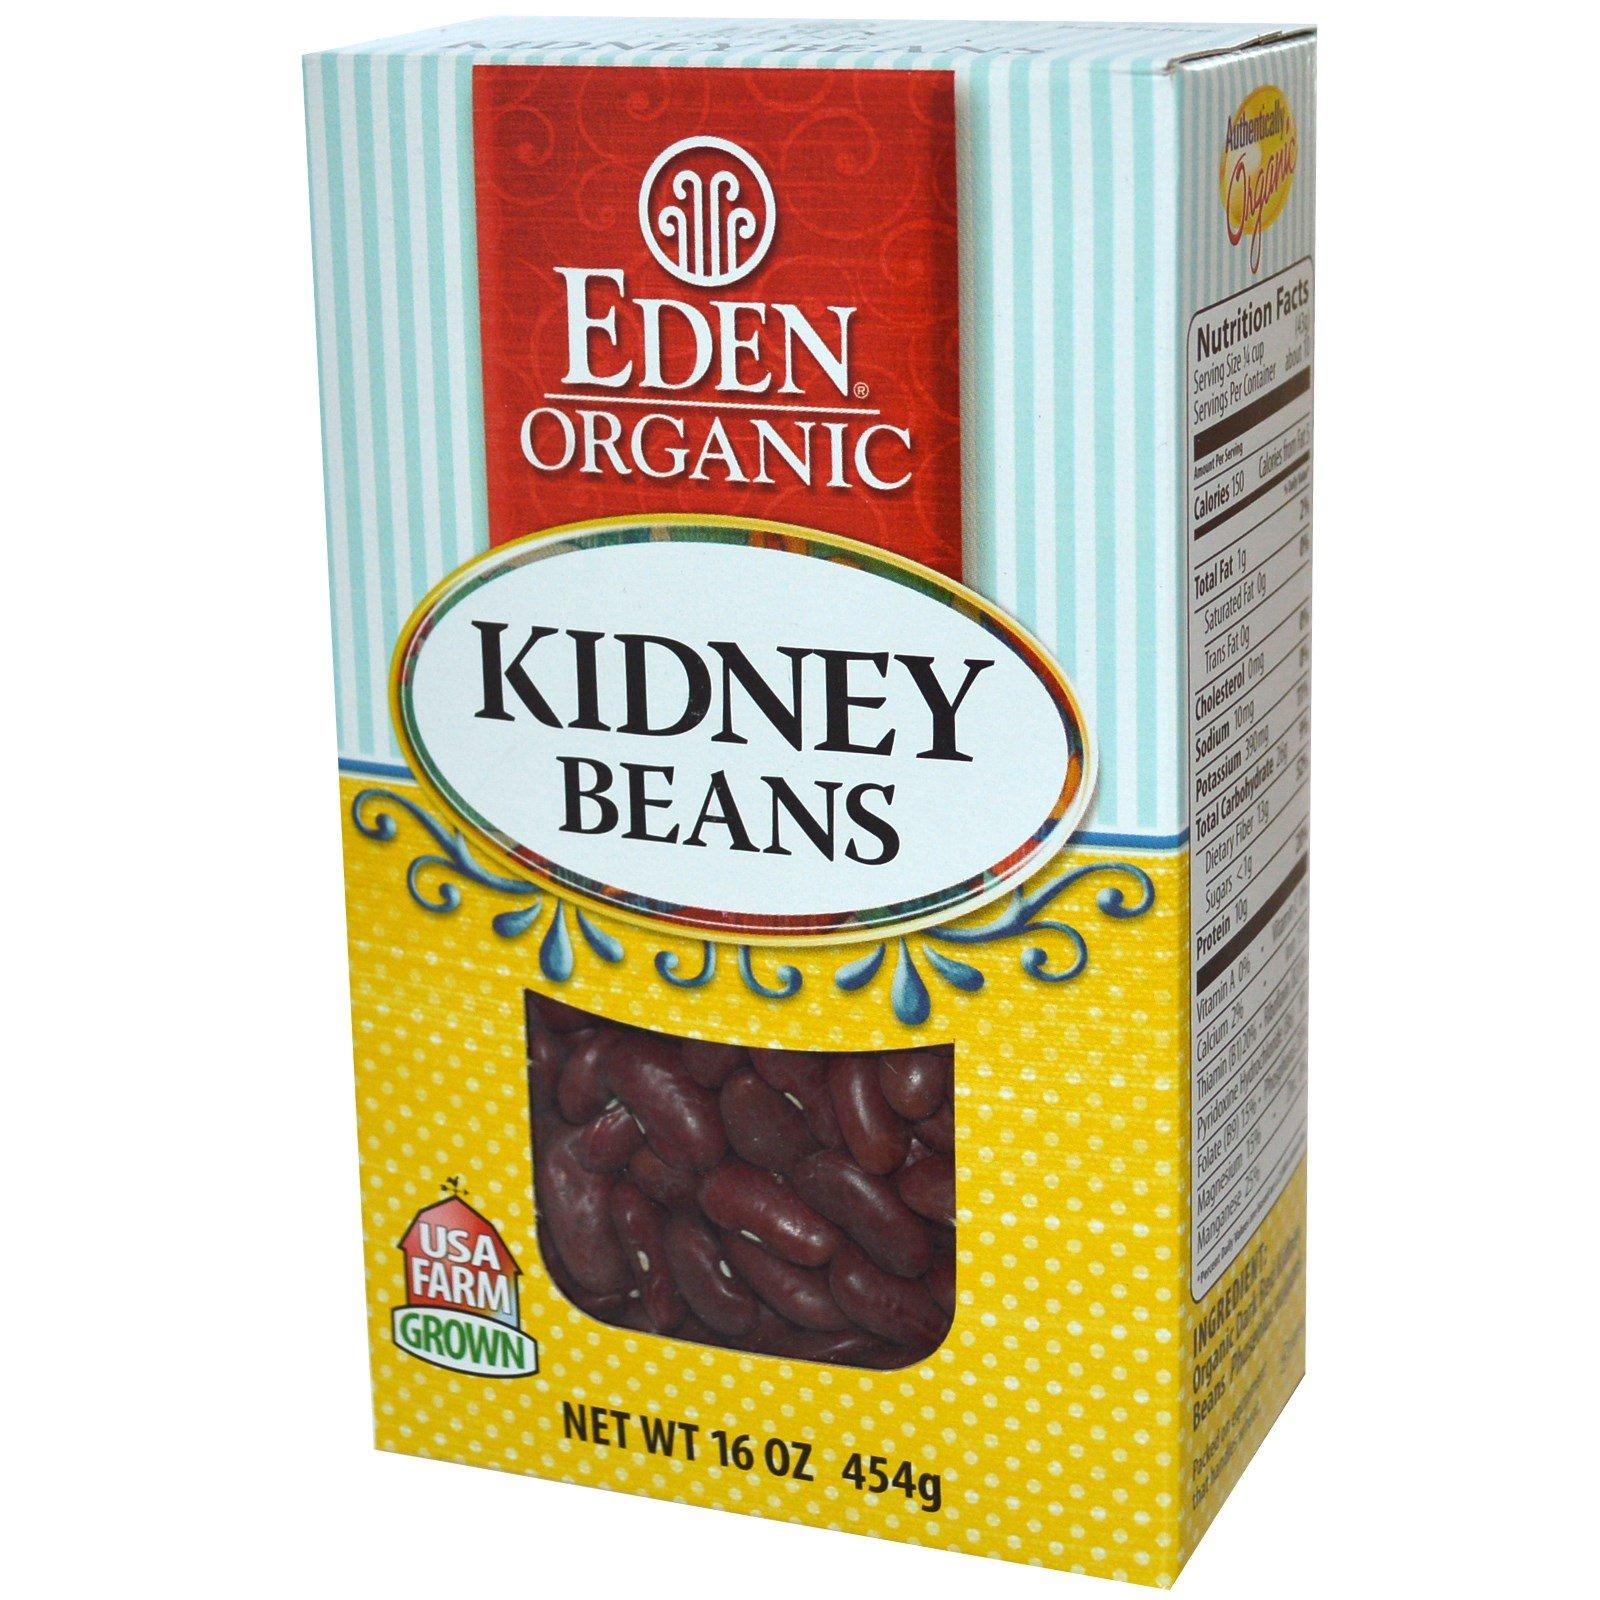 Eden Foods, Organic, Kidney Beans, 16 oz (454 g) Eden Foods, Organic, Kidney Beans, 16 oz (454 g) - 2pcs by Eden